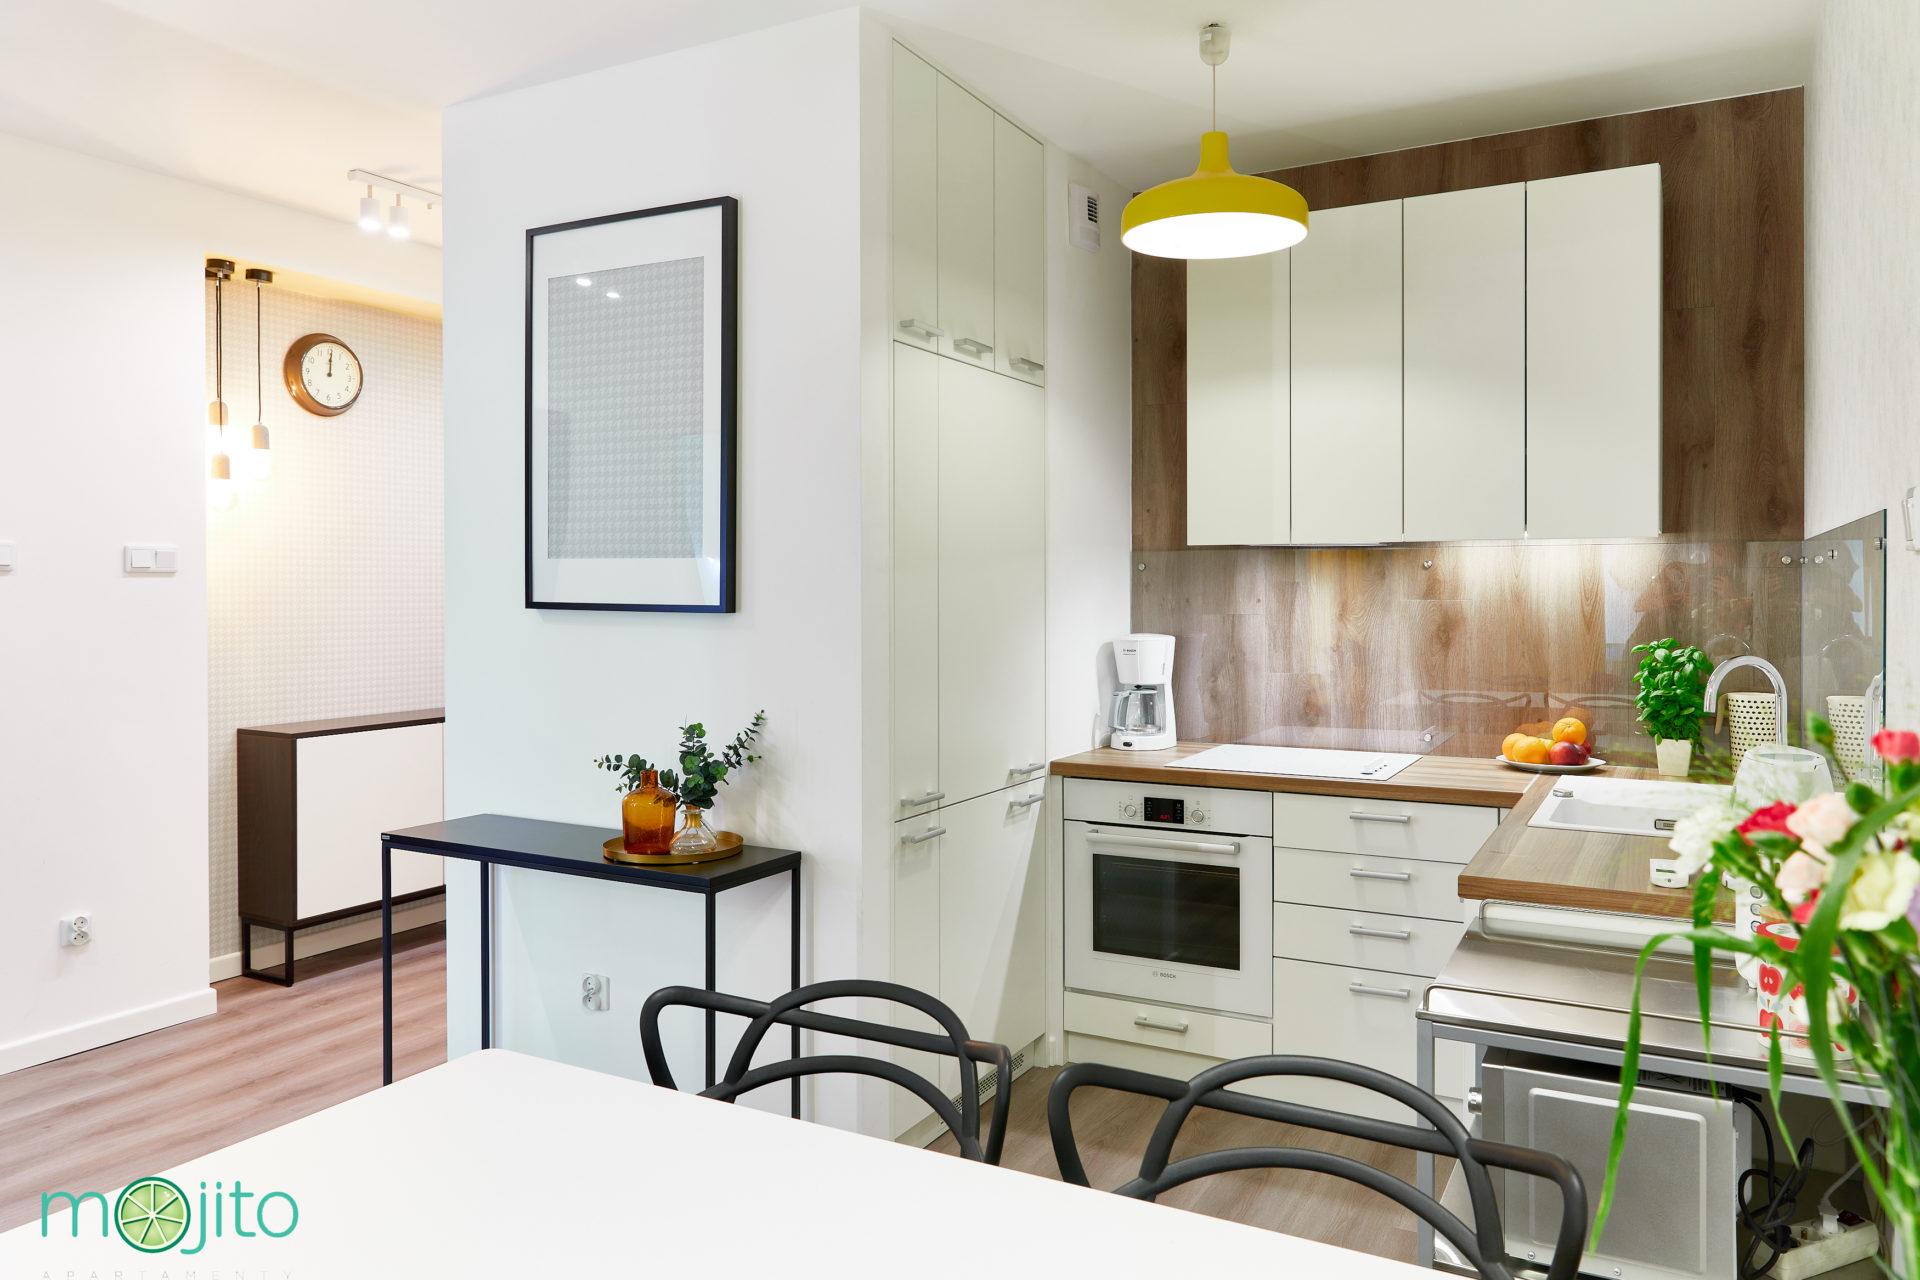 kuchnia,apartament vanilia,mojito apartamenty, projekt wnętrz, architekt wrocław, kore, julia koczur 02